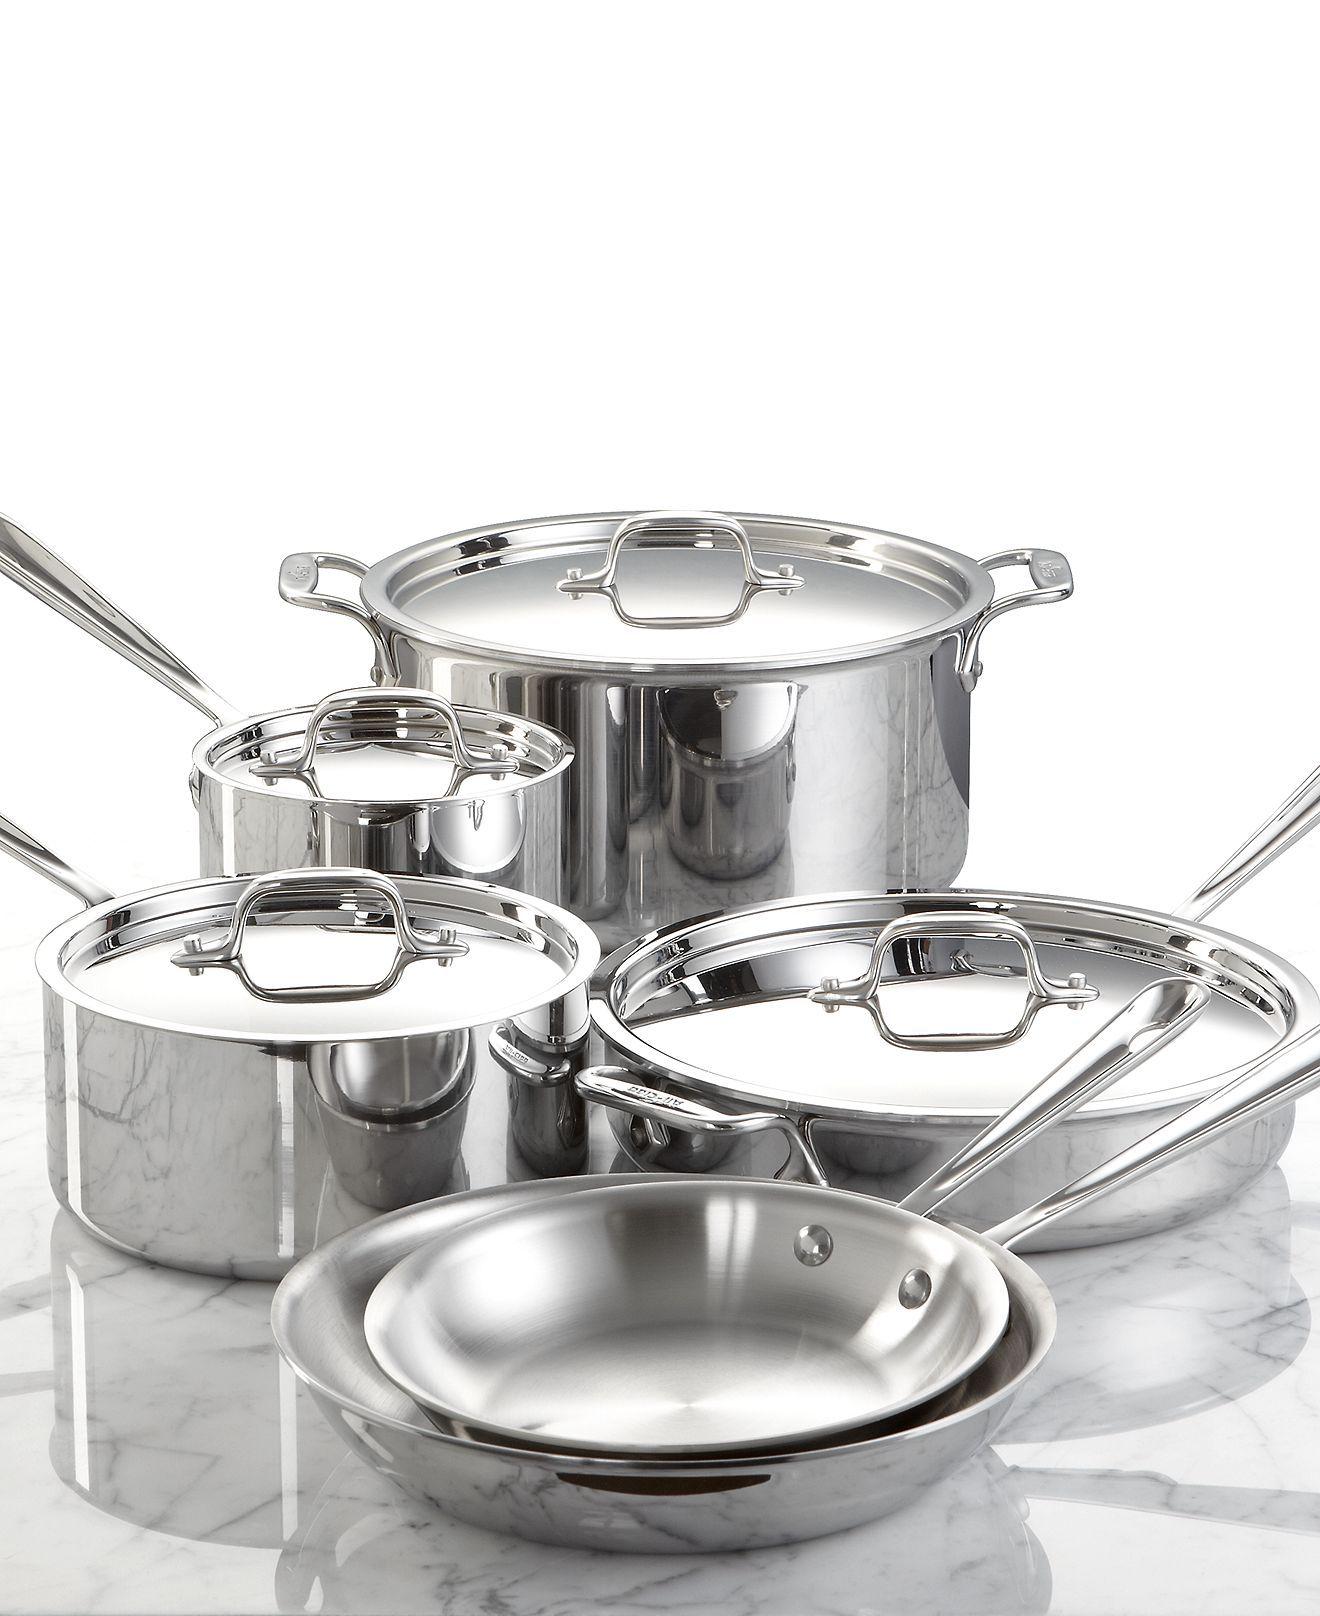 Allclad stainless steel cookware 10 piece set cookware